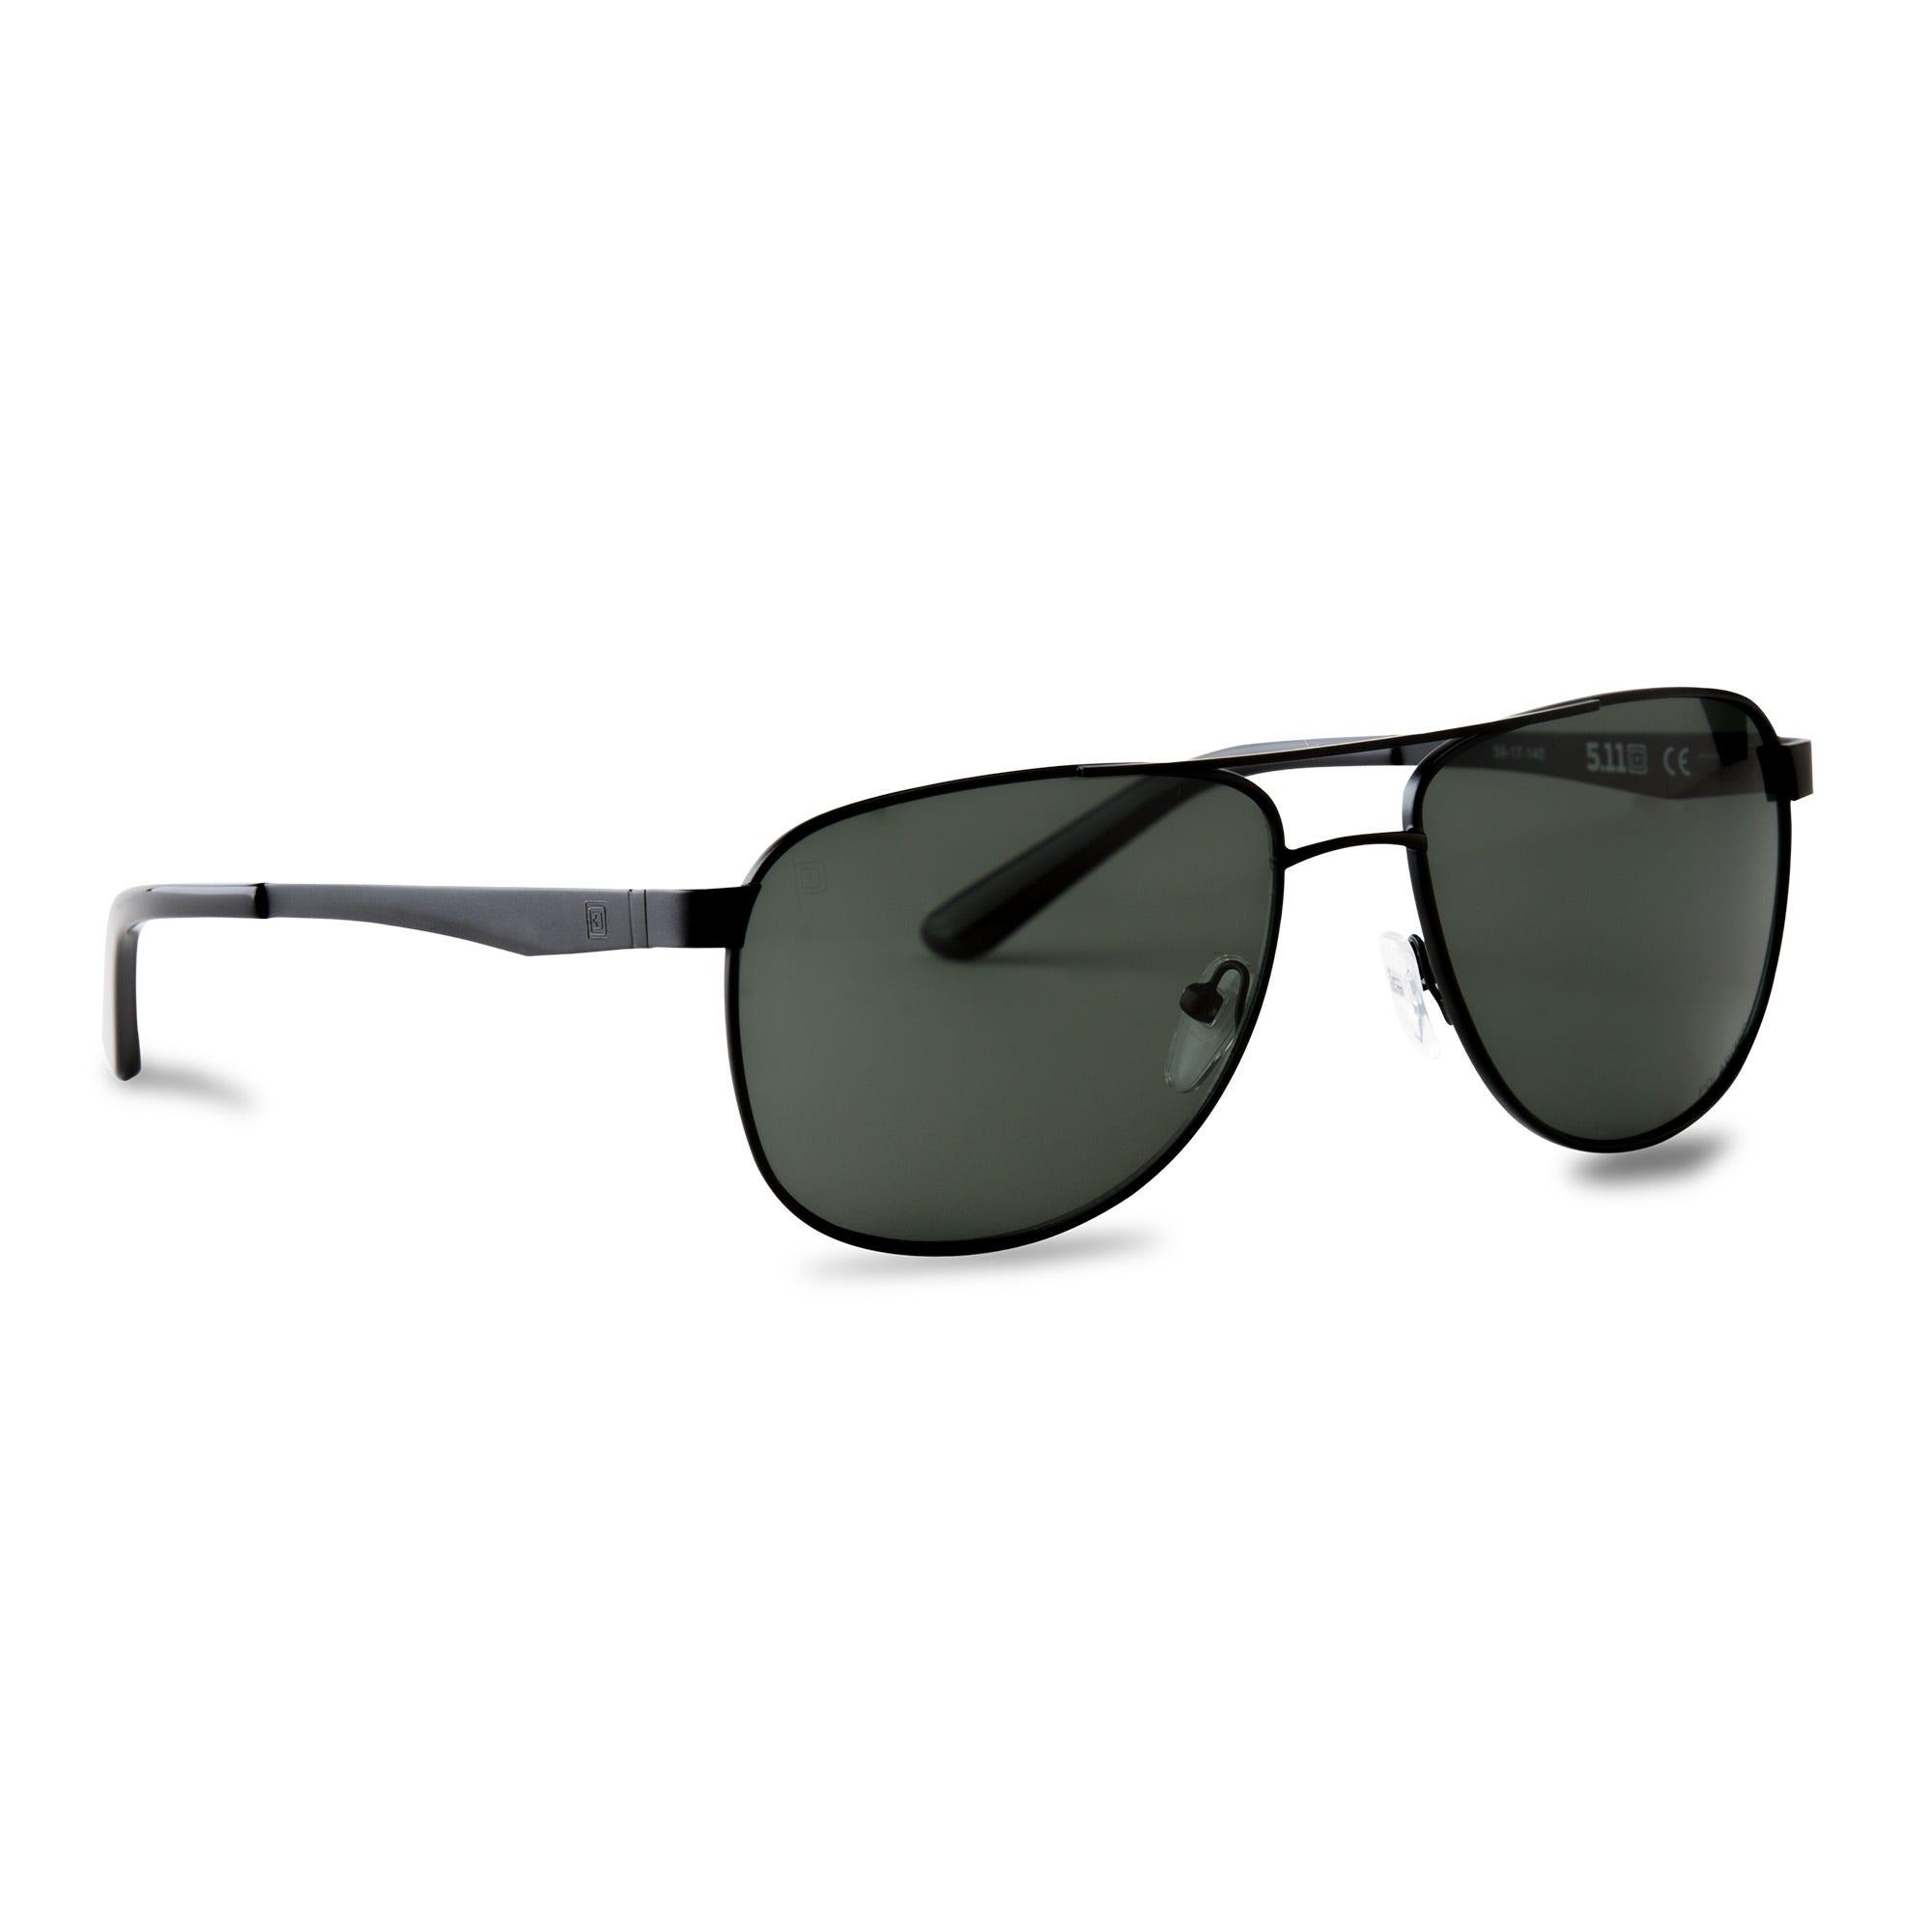 1d4faffa04 Tomcat Black Oxide Polarized Sunglasses - 5.11 Tactical